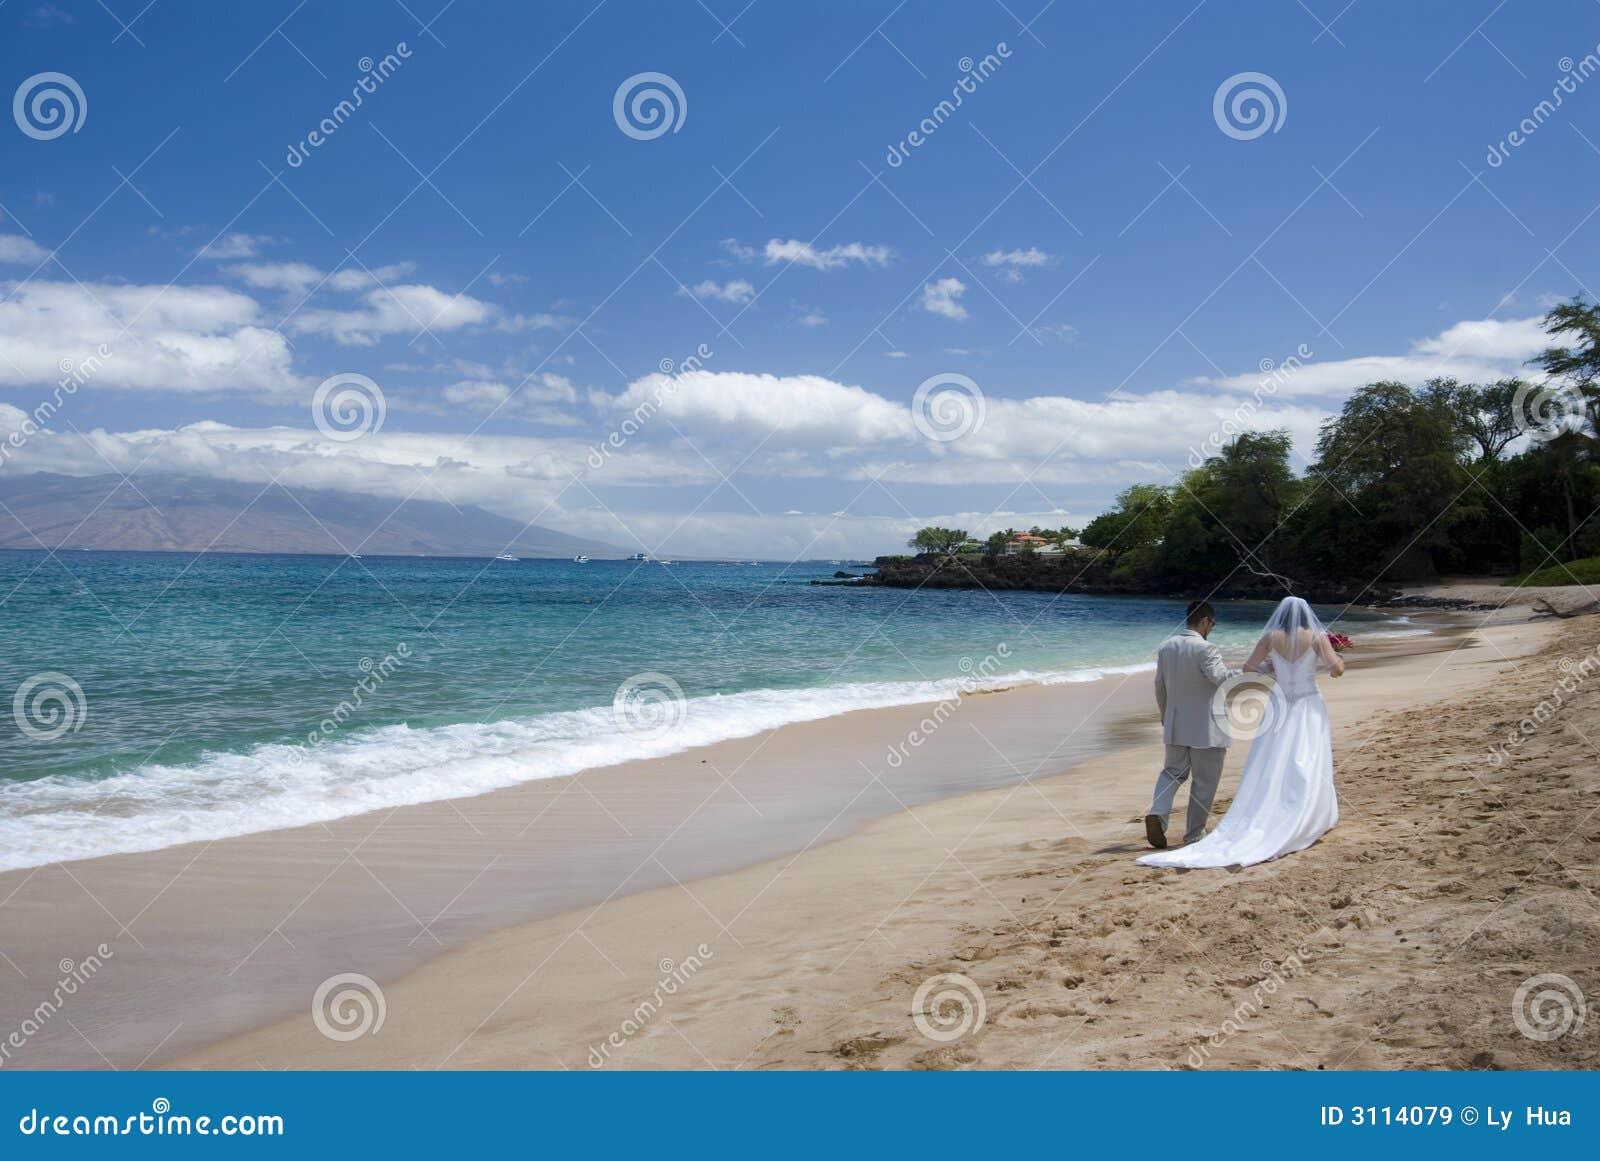 Exotic Beach Wedding Wide view